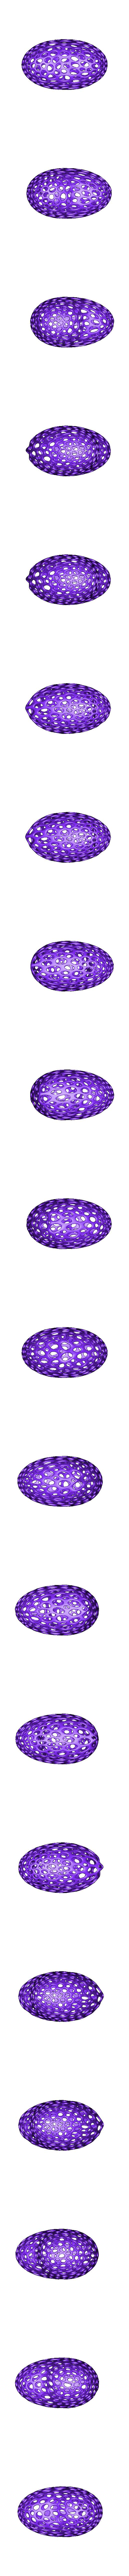 Heart_-_Voronoi_A.stl Download free STL file Heart - Voronoi Style • 3D printable object, Numbmond